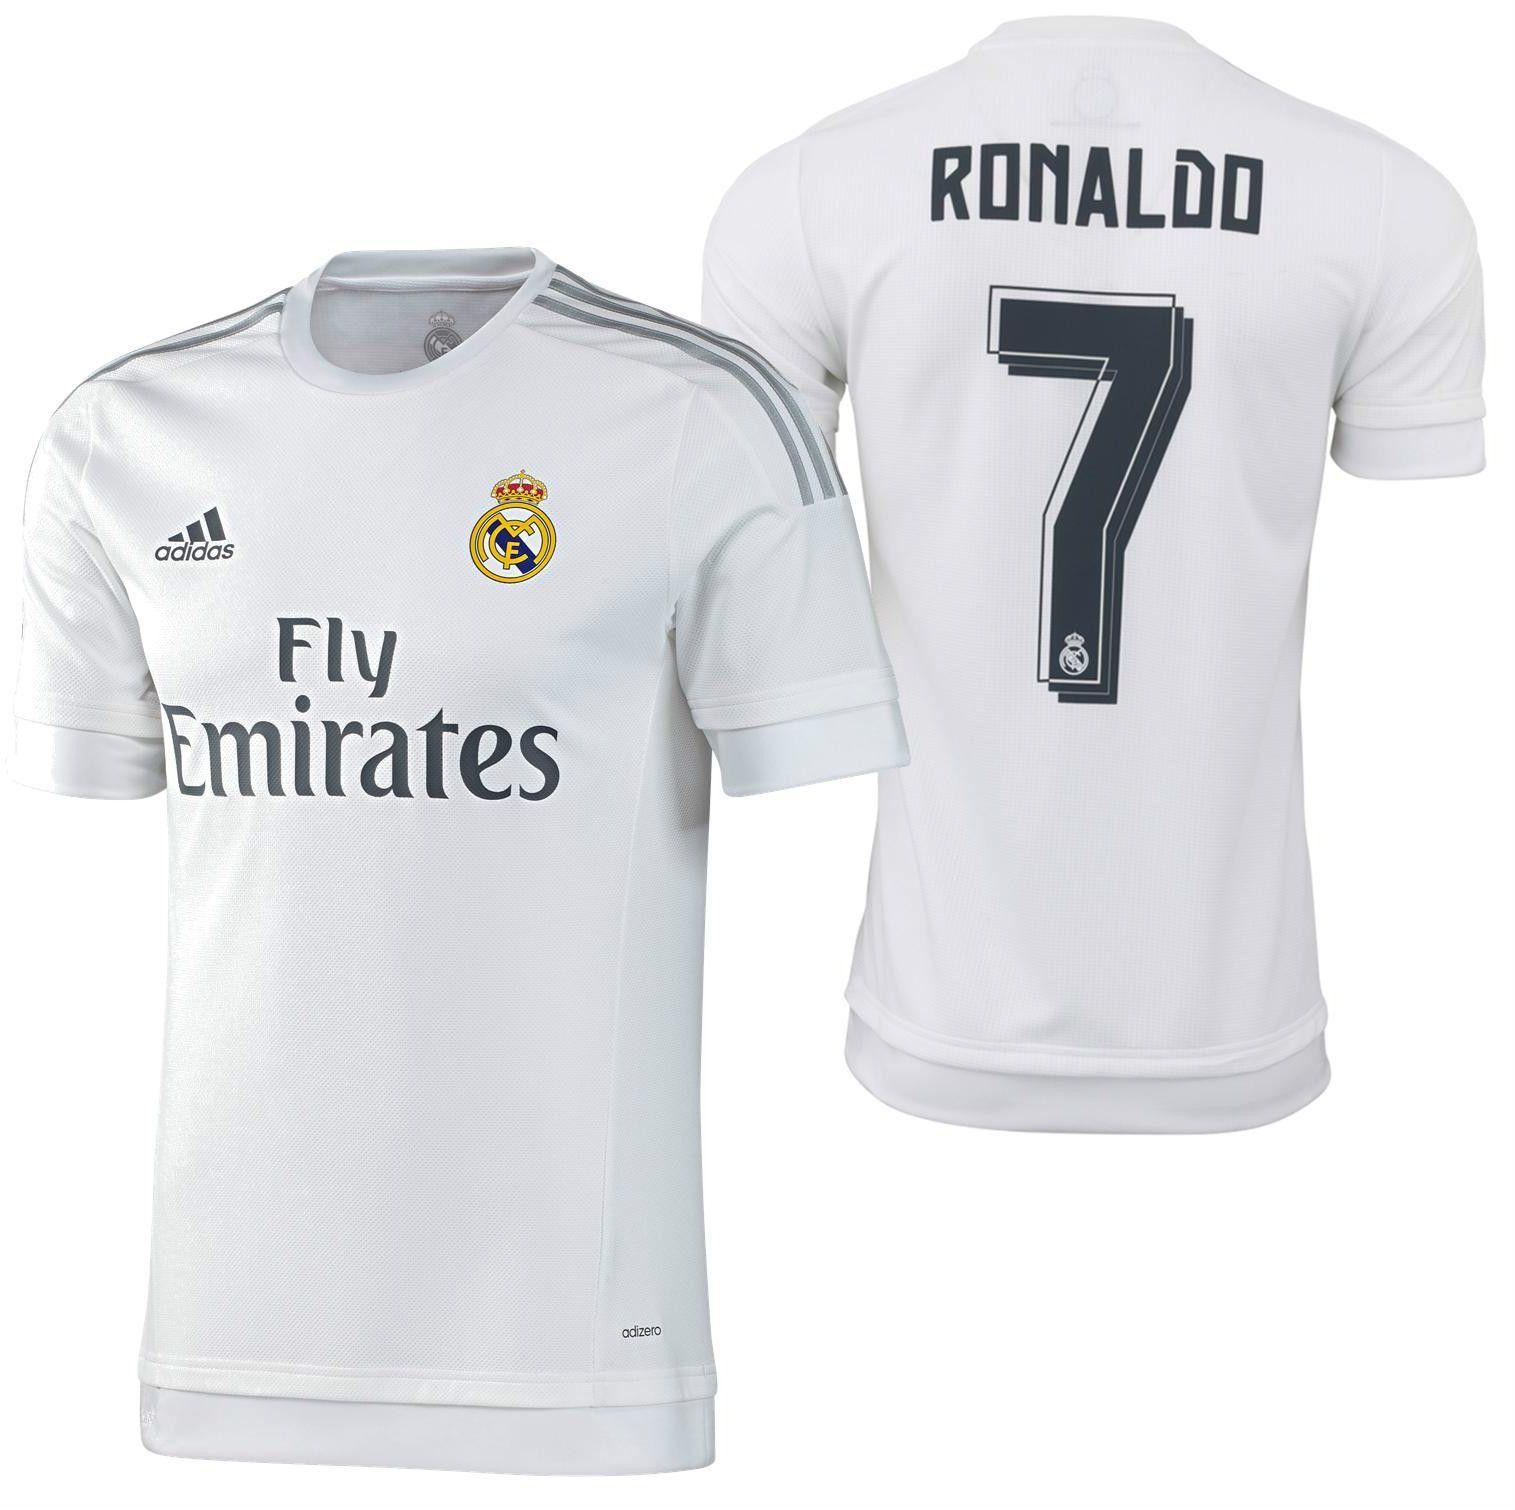 695b76c1e50 ... reduced adidas cristiano ronaldo real madrid authentic home match jersey  201516 d4e0d be9b3